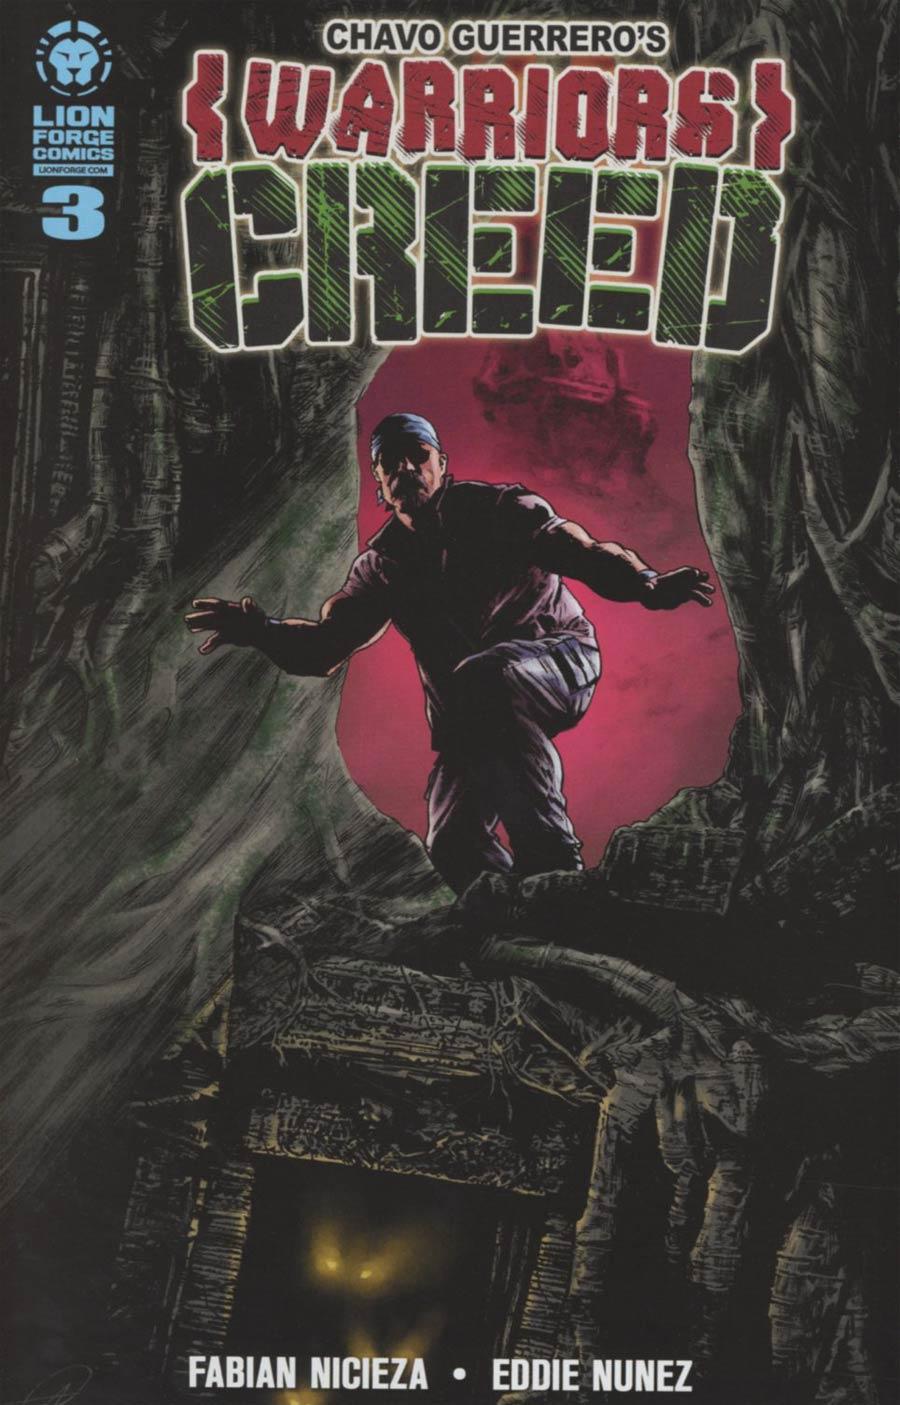 Chavo Guerreros Warriors Creed #3 English Edition